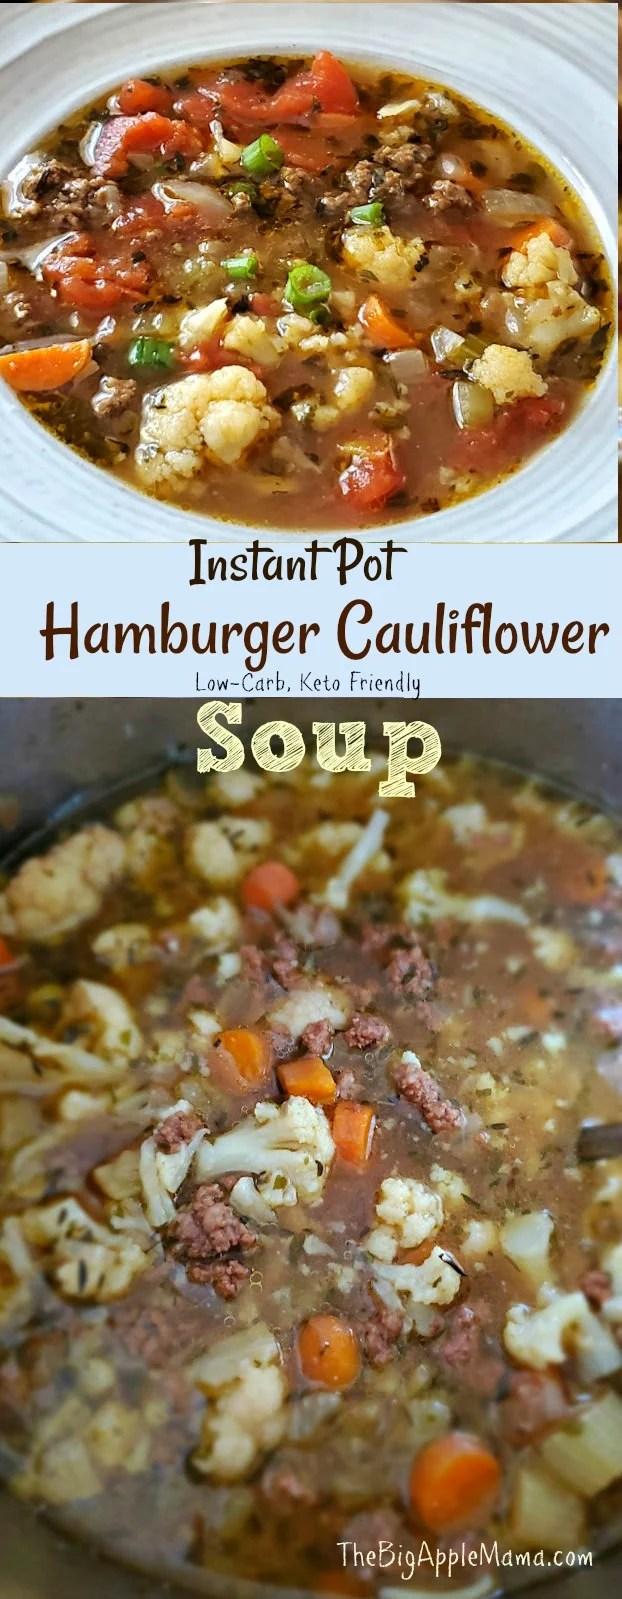 Instant Pot Hamburger Cauliflower soup recipe, Low carb, Keto friendly